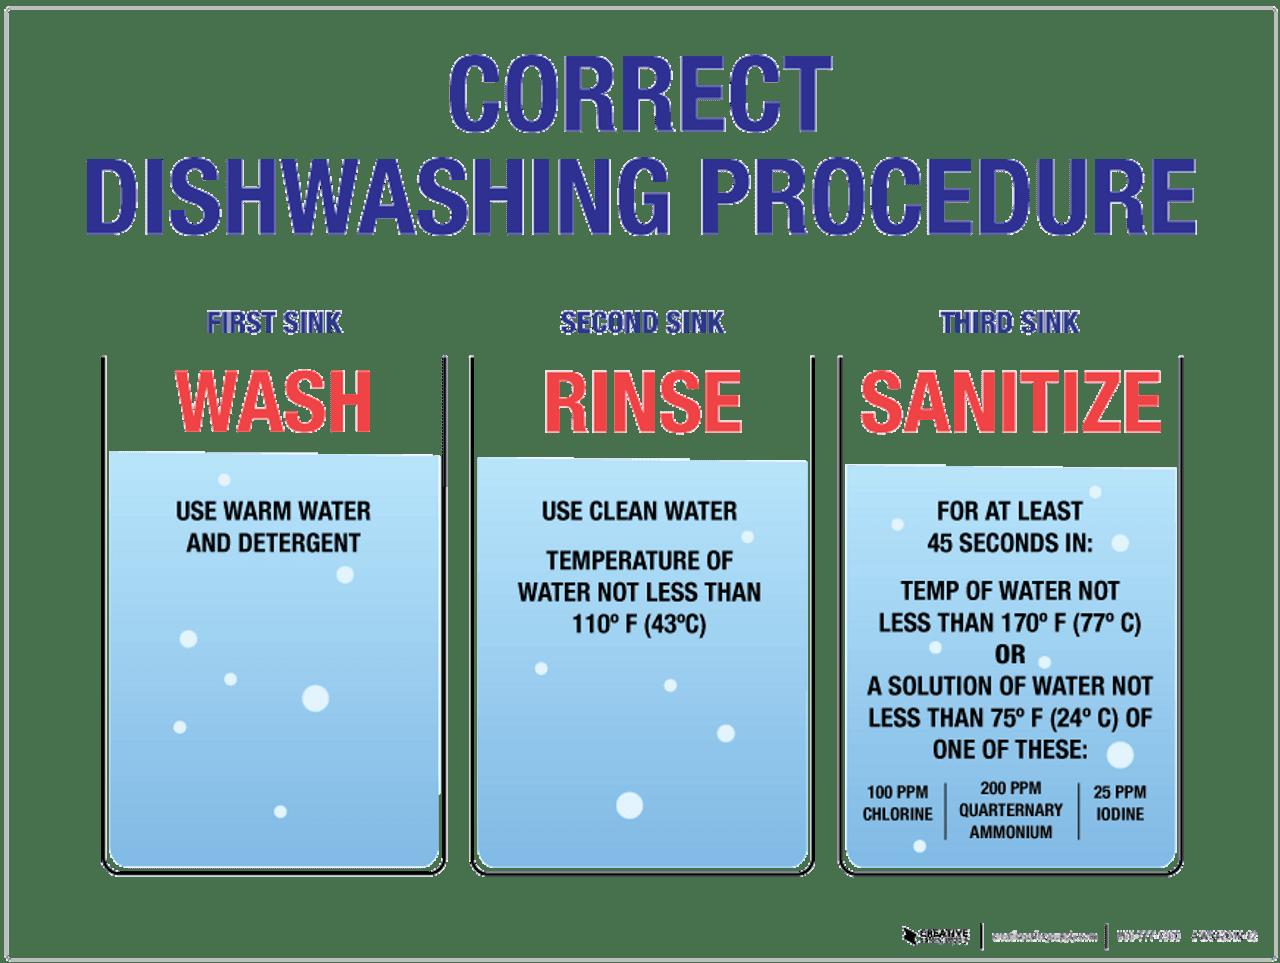 graphic regarding Wash Rinse Sanitize Printable Signs called Clean Rinse Sanitize - Wall Signal